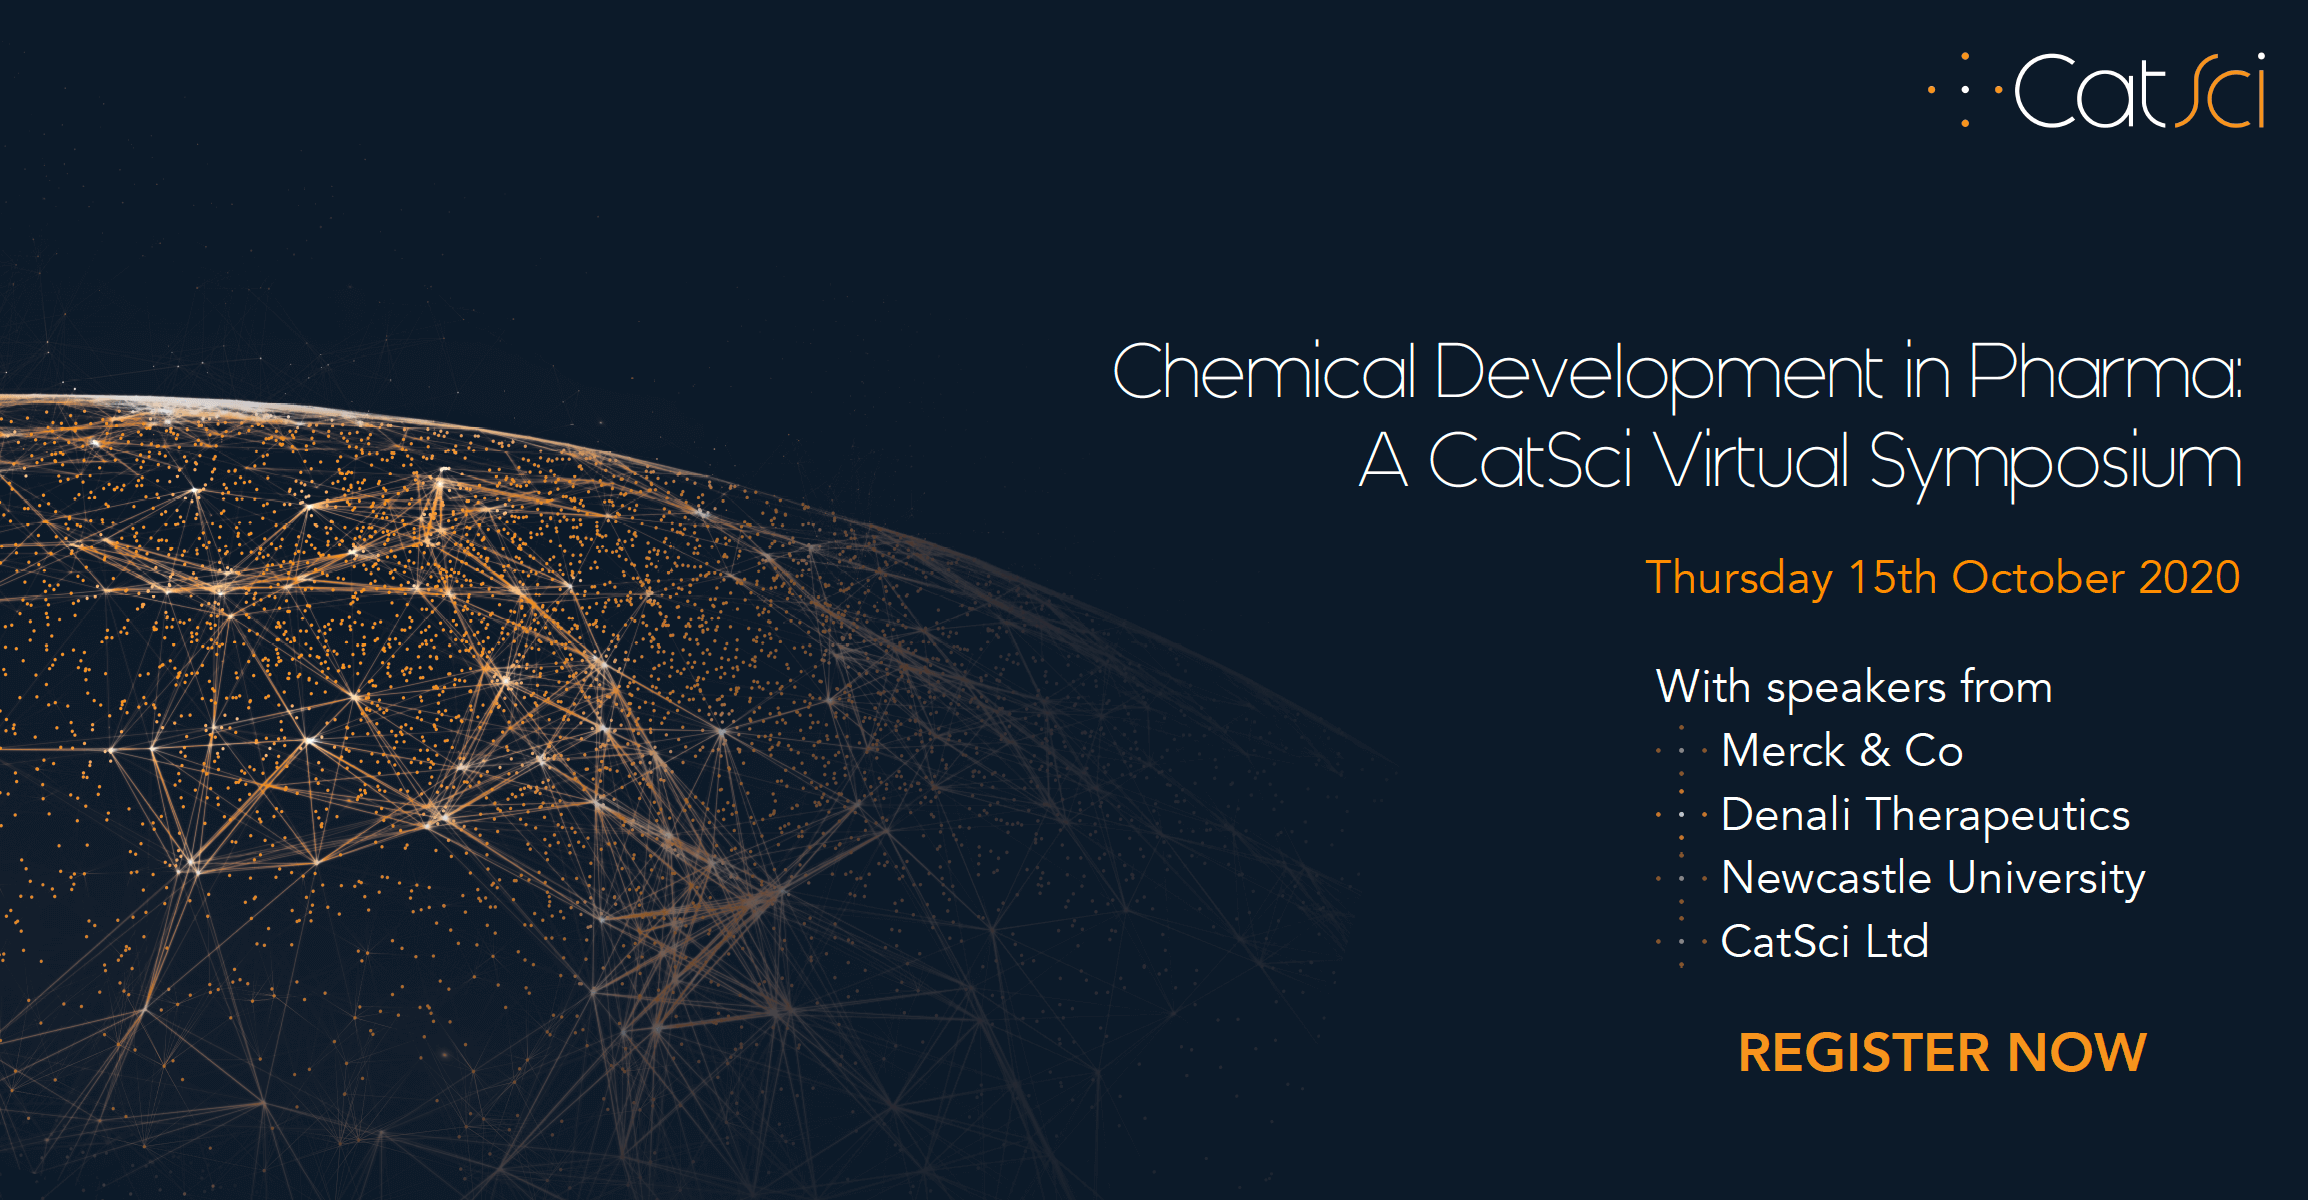 Chemical Development in Pharma: A CatSci Virtual Symposium